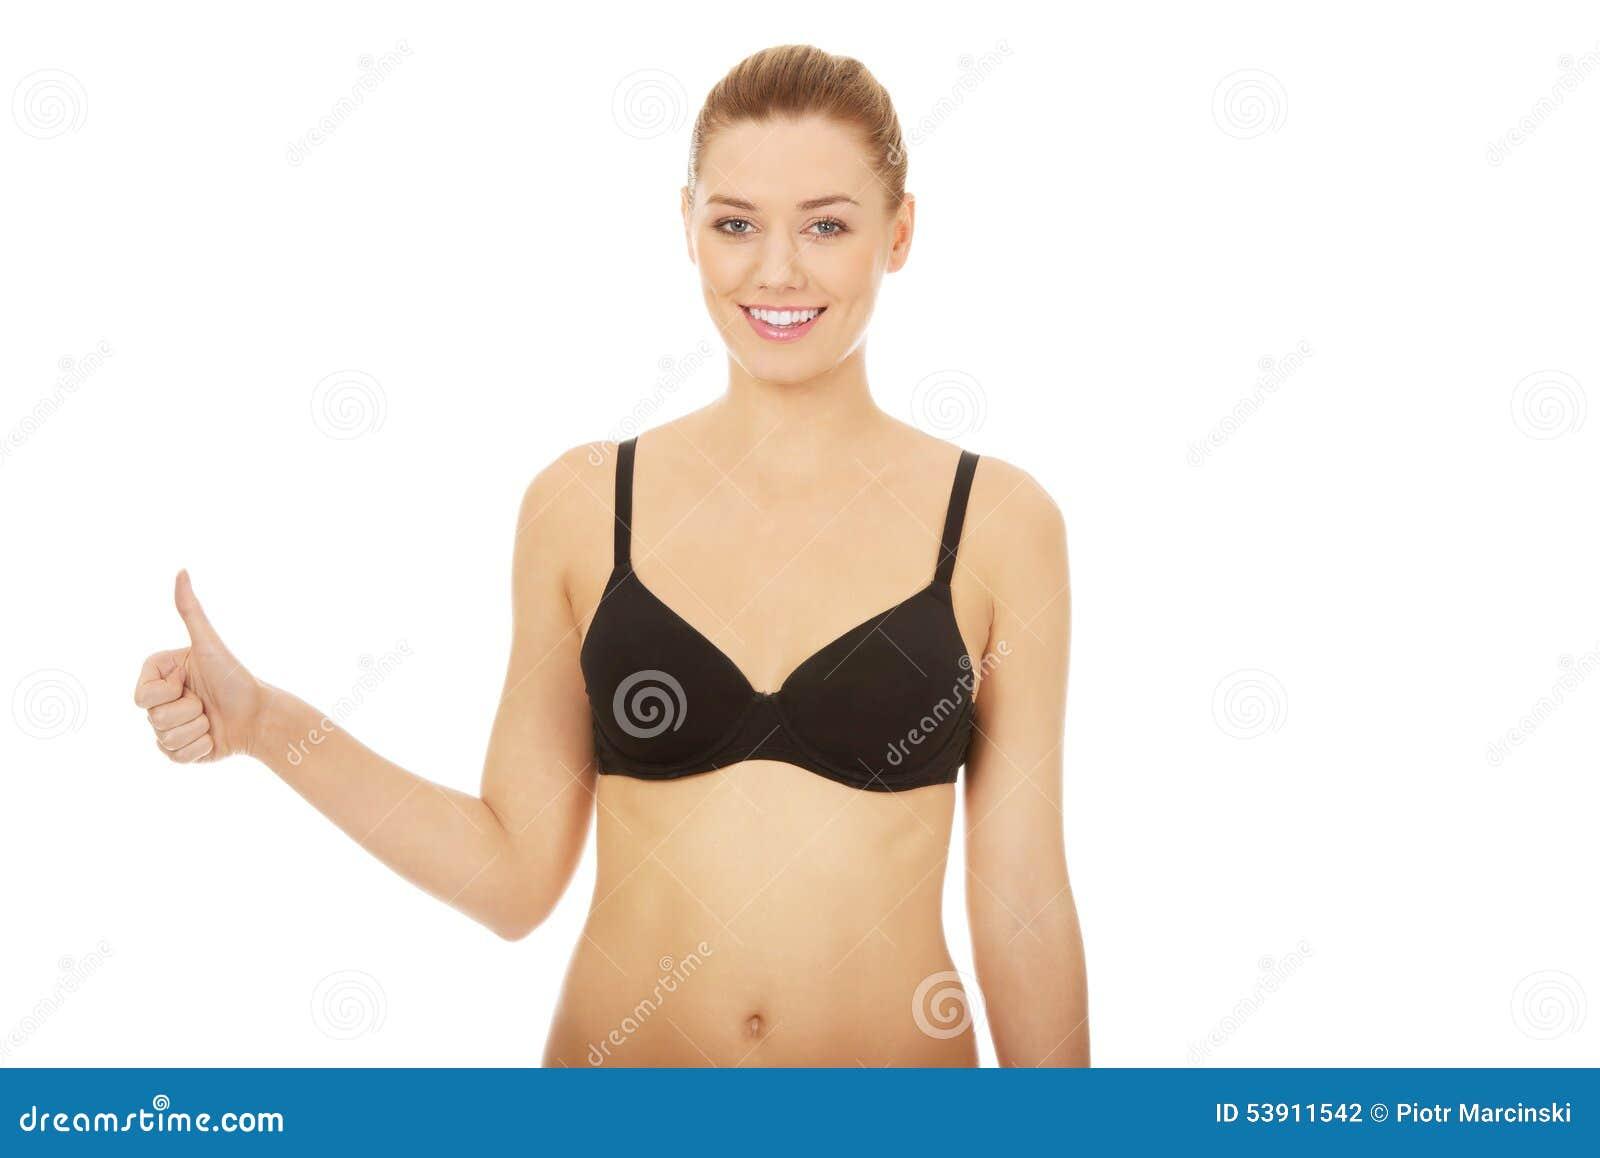 Pakistane model women sax image